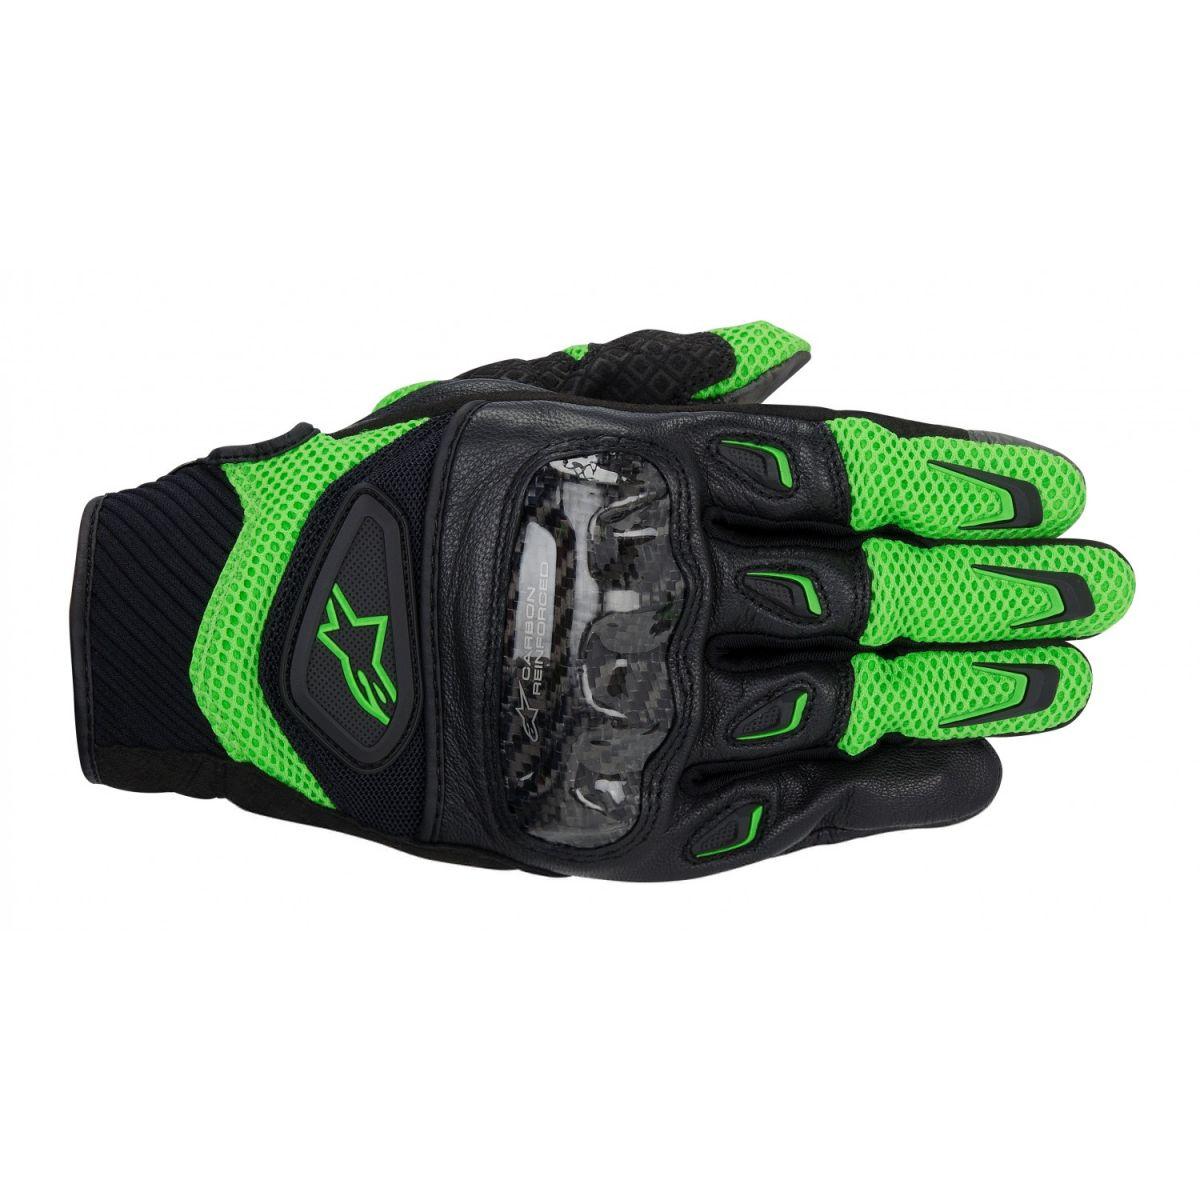 Luva Alpinestars SMX-2 Air Carbon Green/Black  - Nova Suzuki Motos e Acessórios